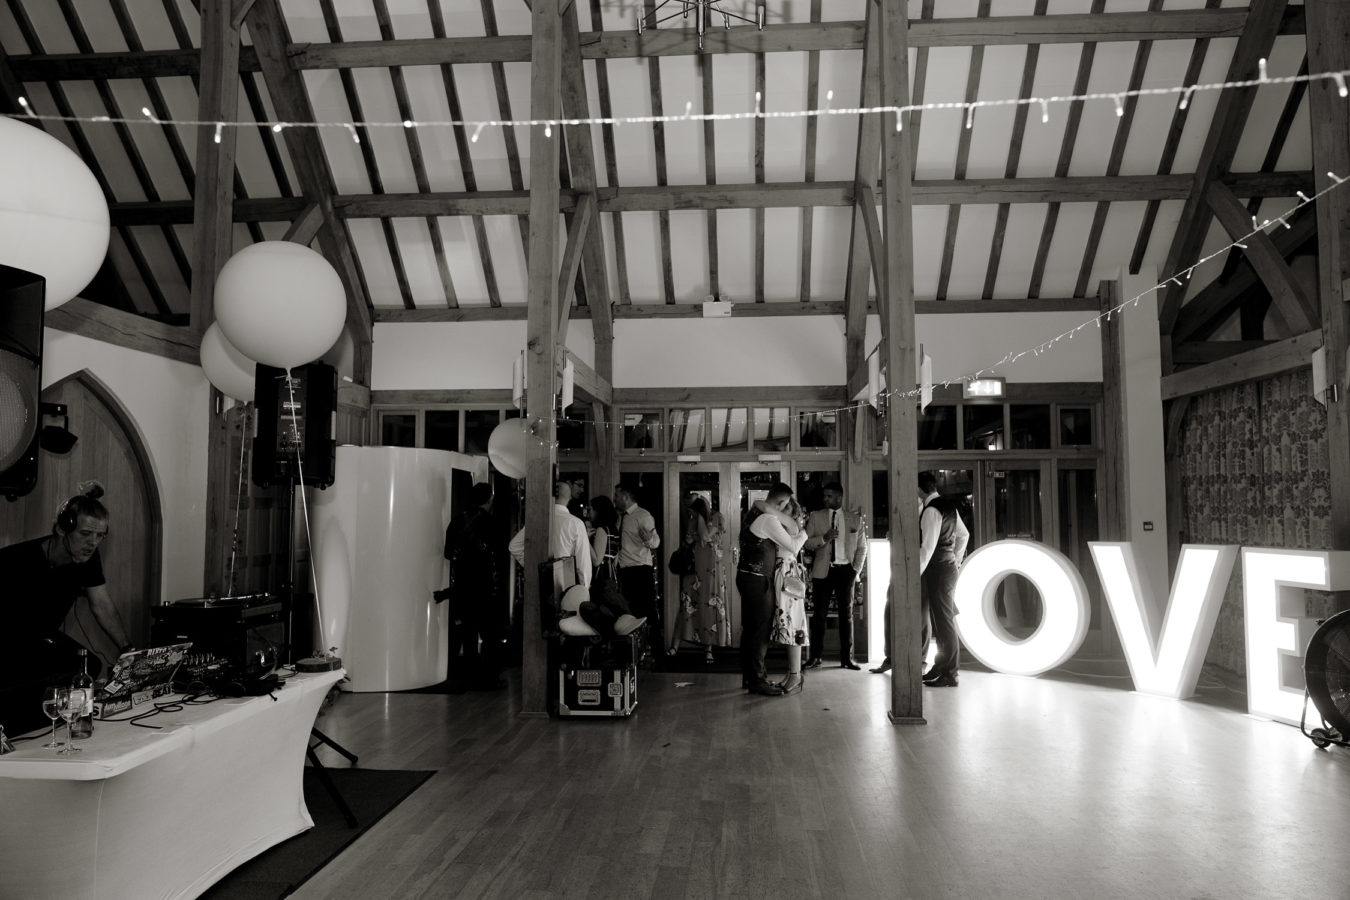 Illuminated LOVE letters wedding hire evening reception dance floor